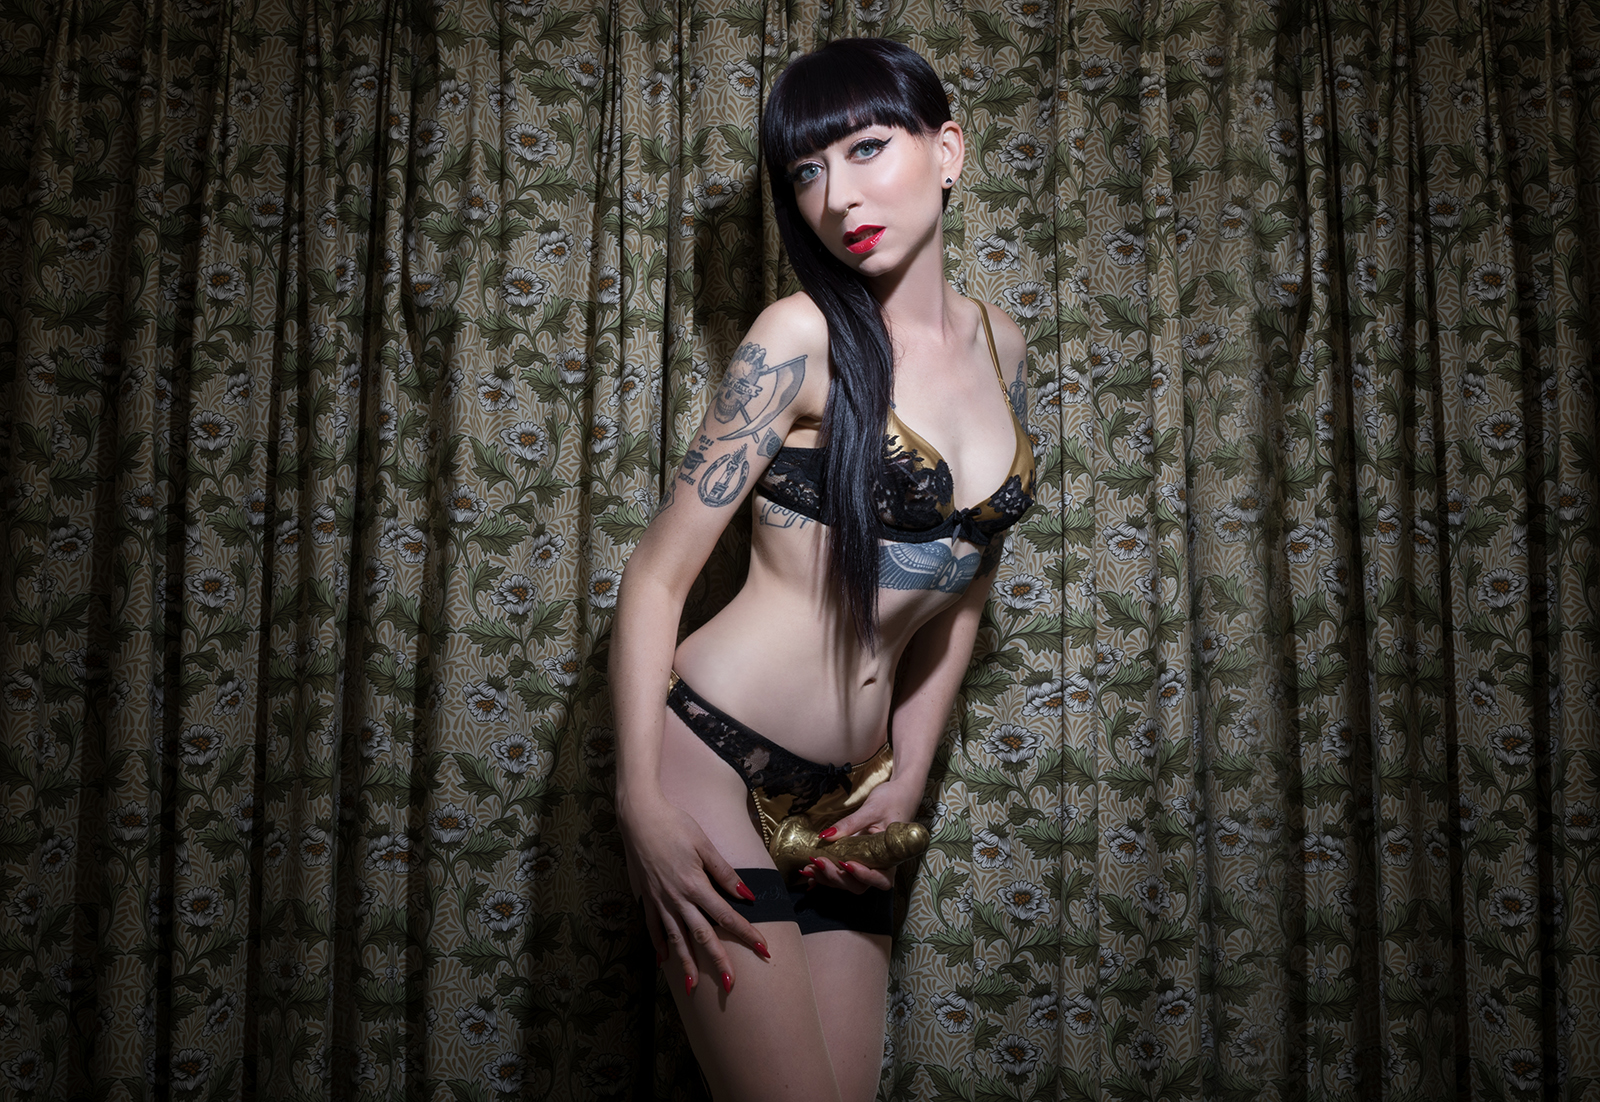 Mistress_Ramona_Ryder_SF_San_Francisco_Escort_Dominatrix_Domme_ GFE_Girlfriend_pegging_strapon_dildo_anal_Queen.jpg